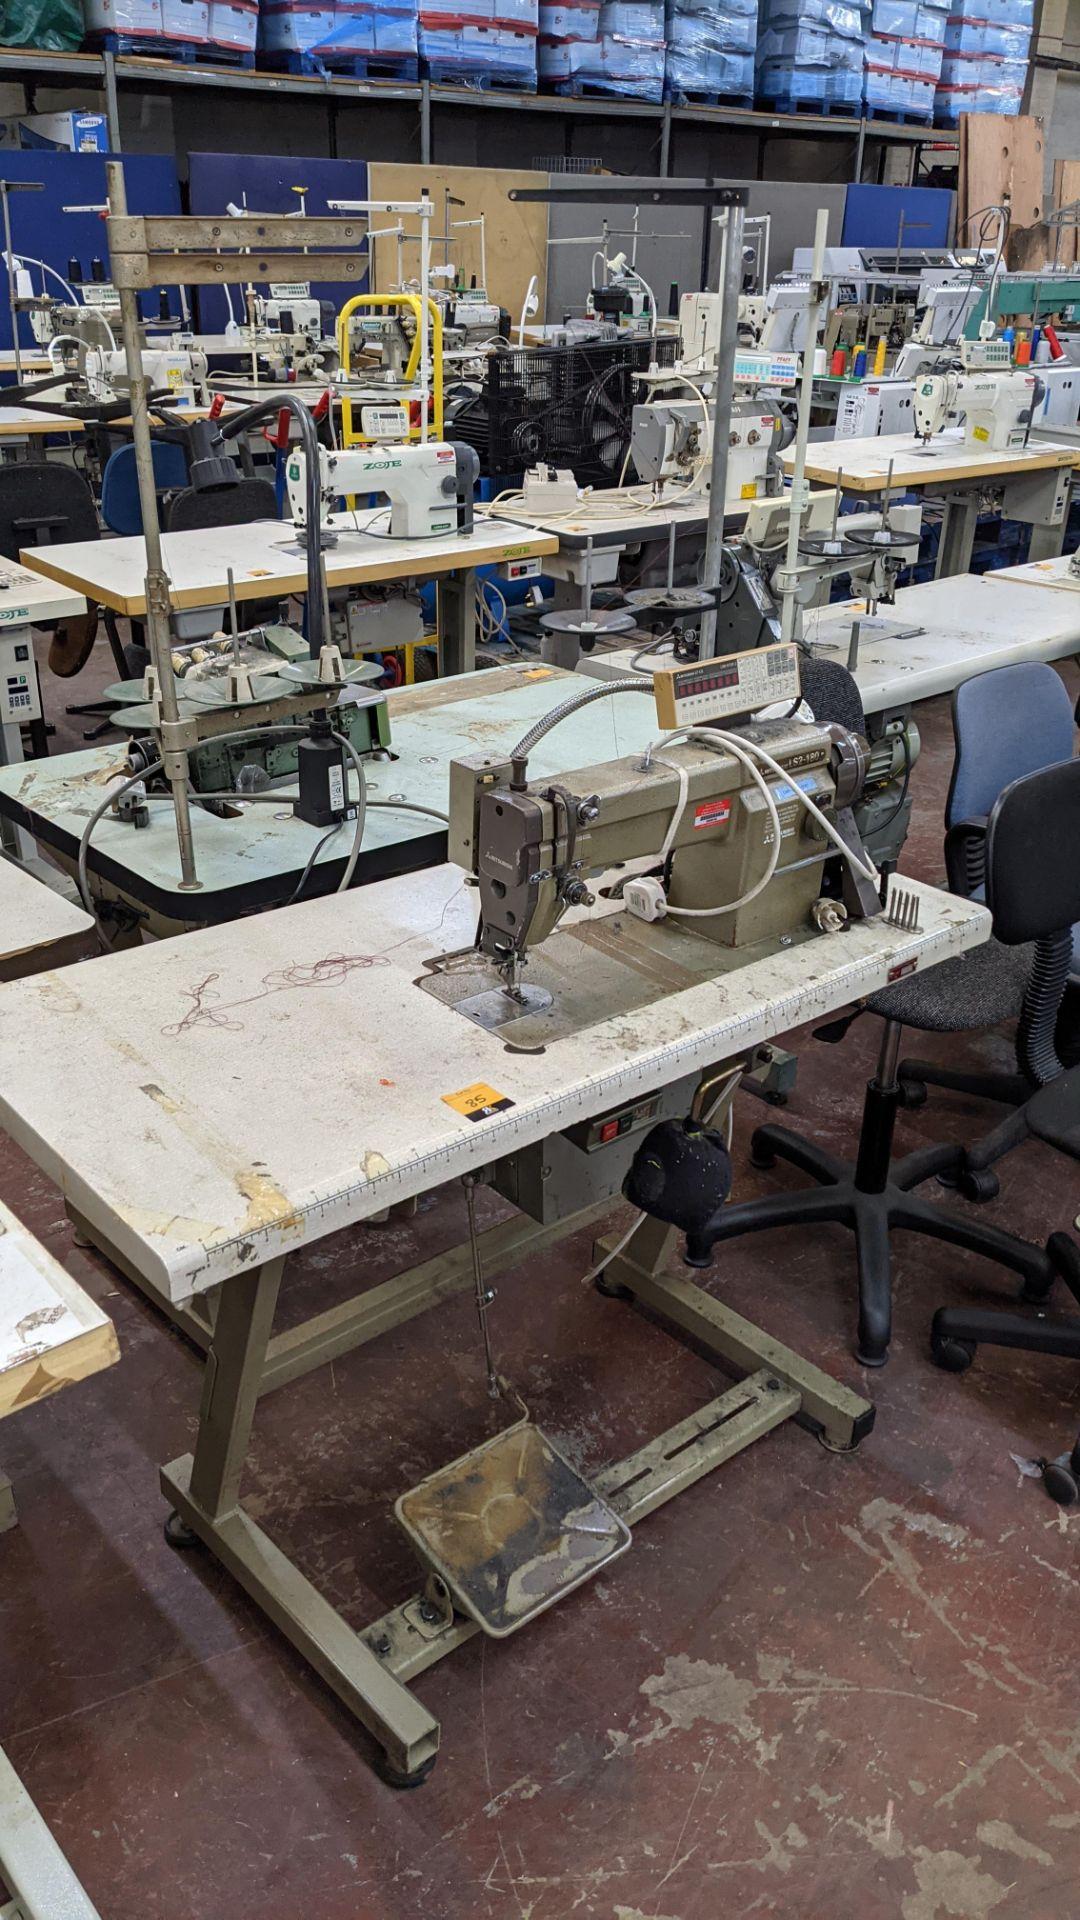 Mitsubishi LS2-180 sewing machine with Mitsubishi LF-C8 digital controller - Image 12 of 12